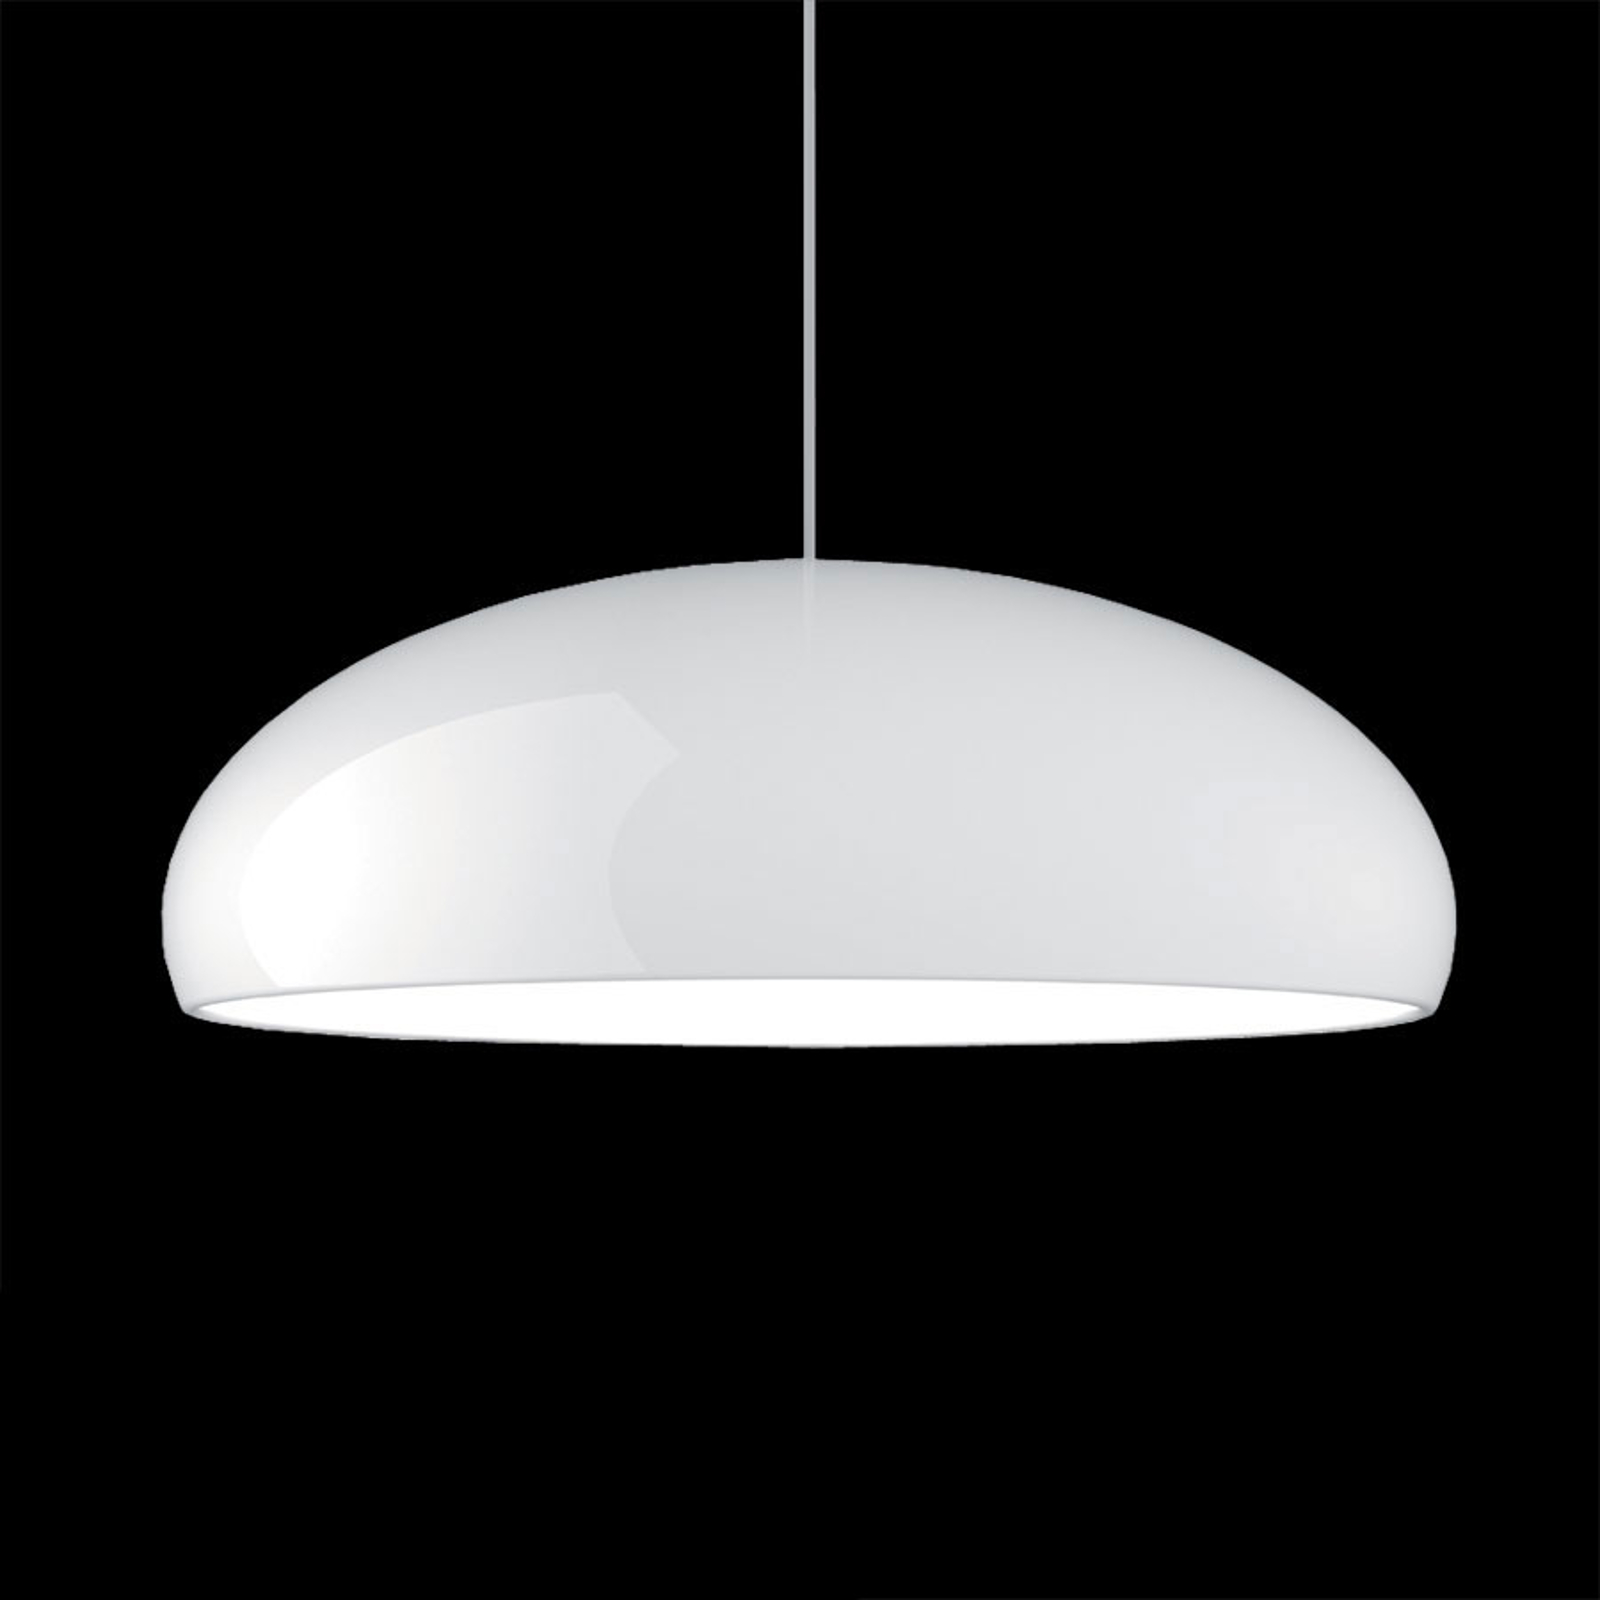 Chique hanglamp Pangen, wit